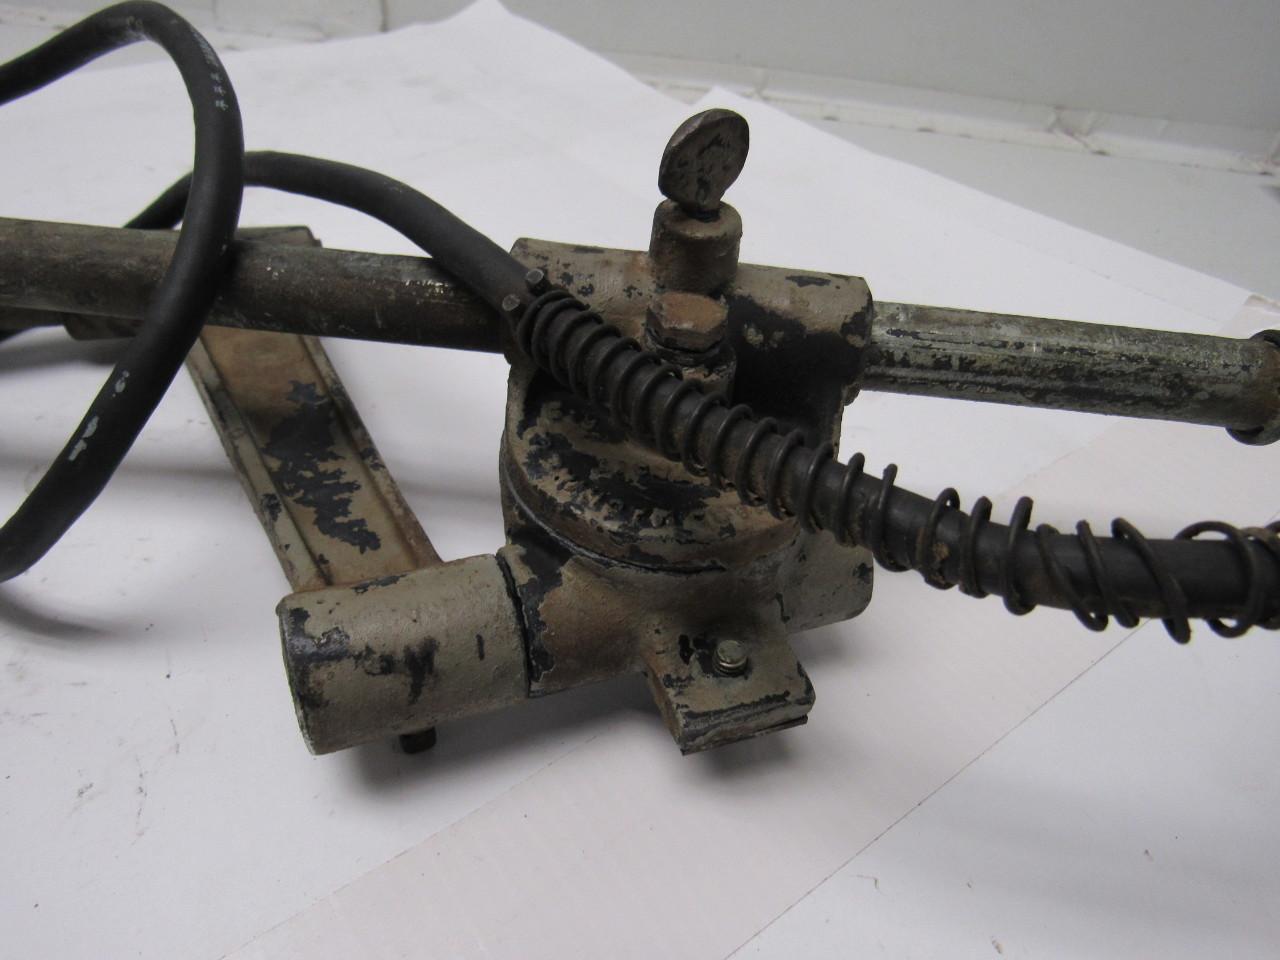 Vintage Industrial Machine Light Task Work Lamp Cast ...  Vintage Industr...